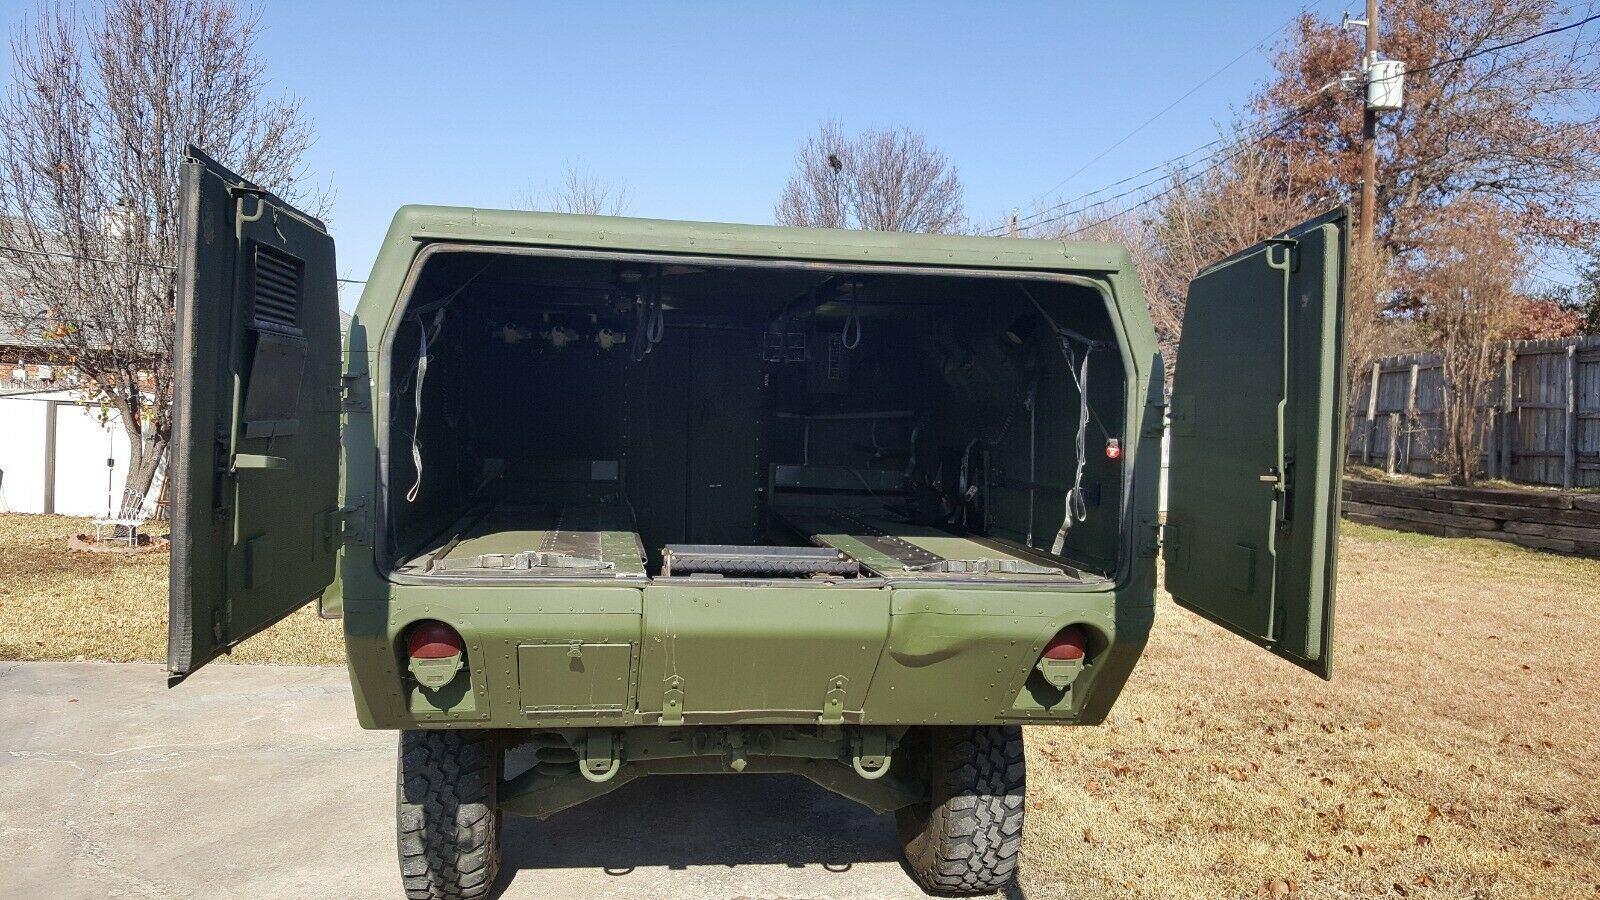 restored 1989 AM General Hummer military